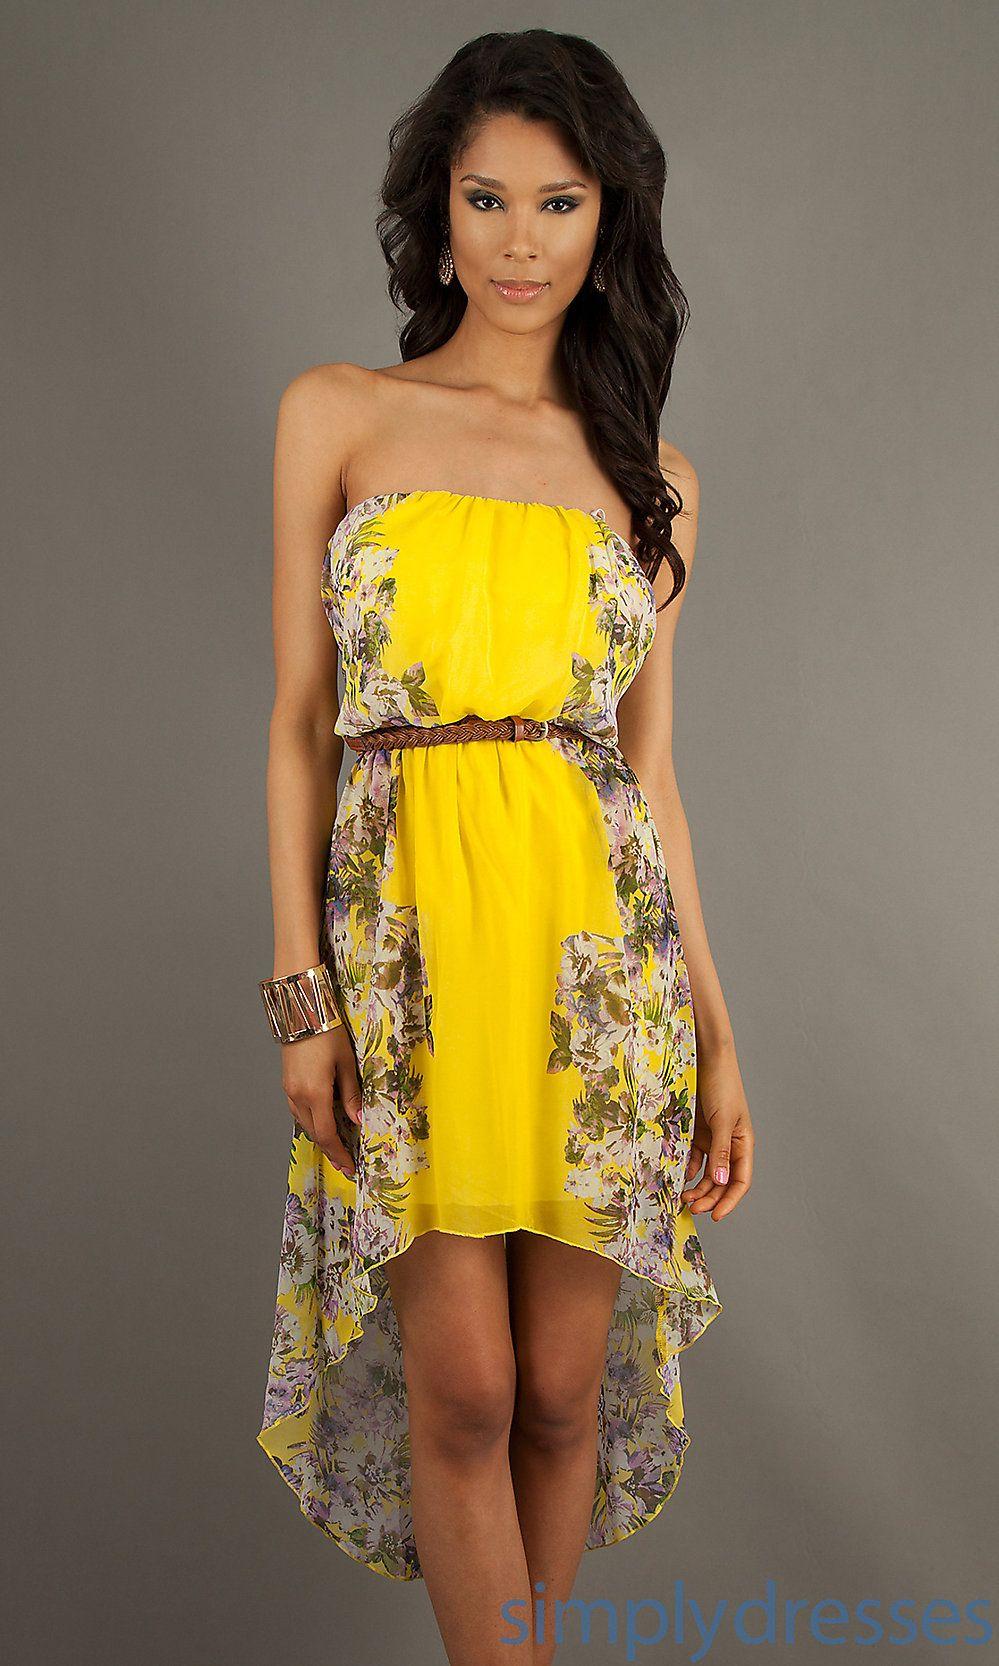 Dress strapless high low print dress simply dresses